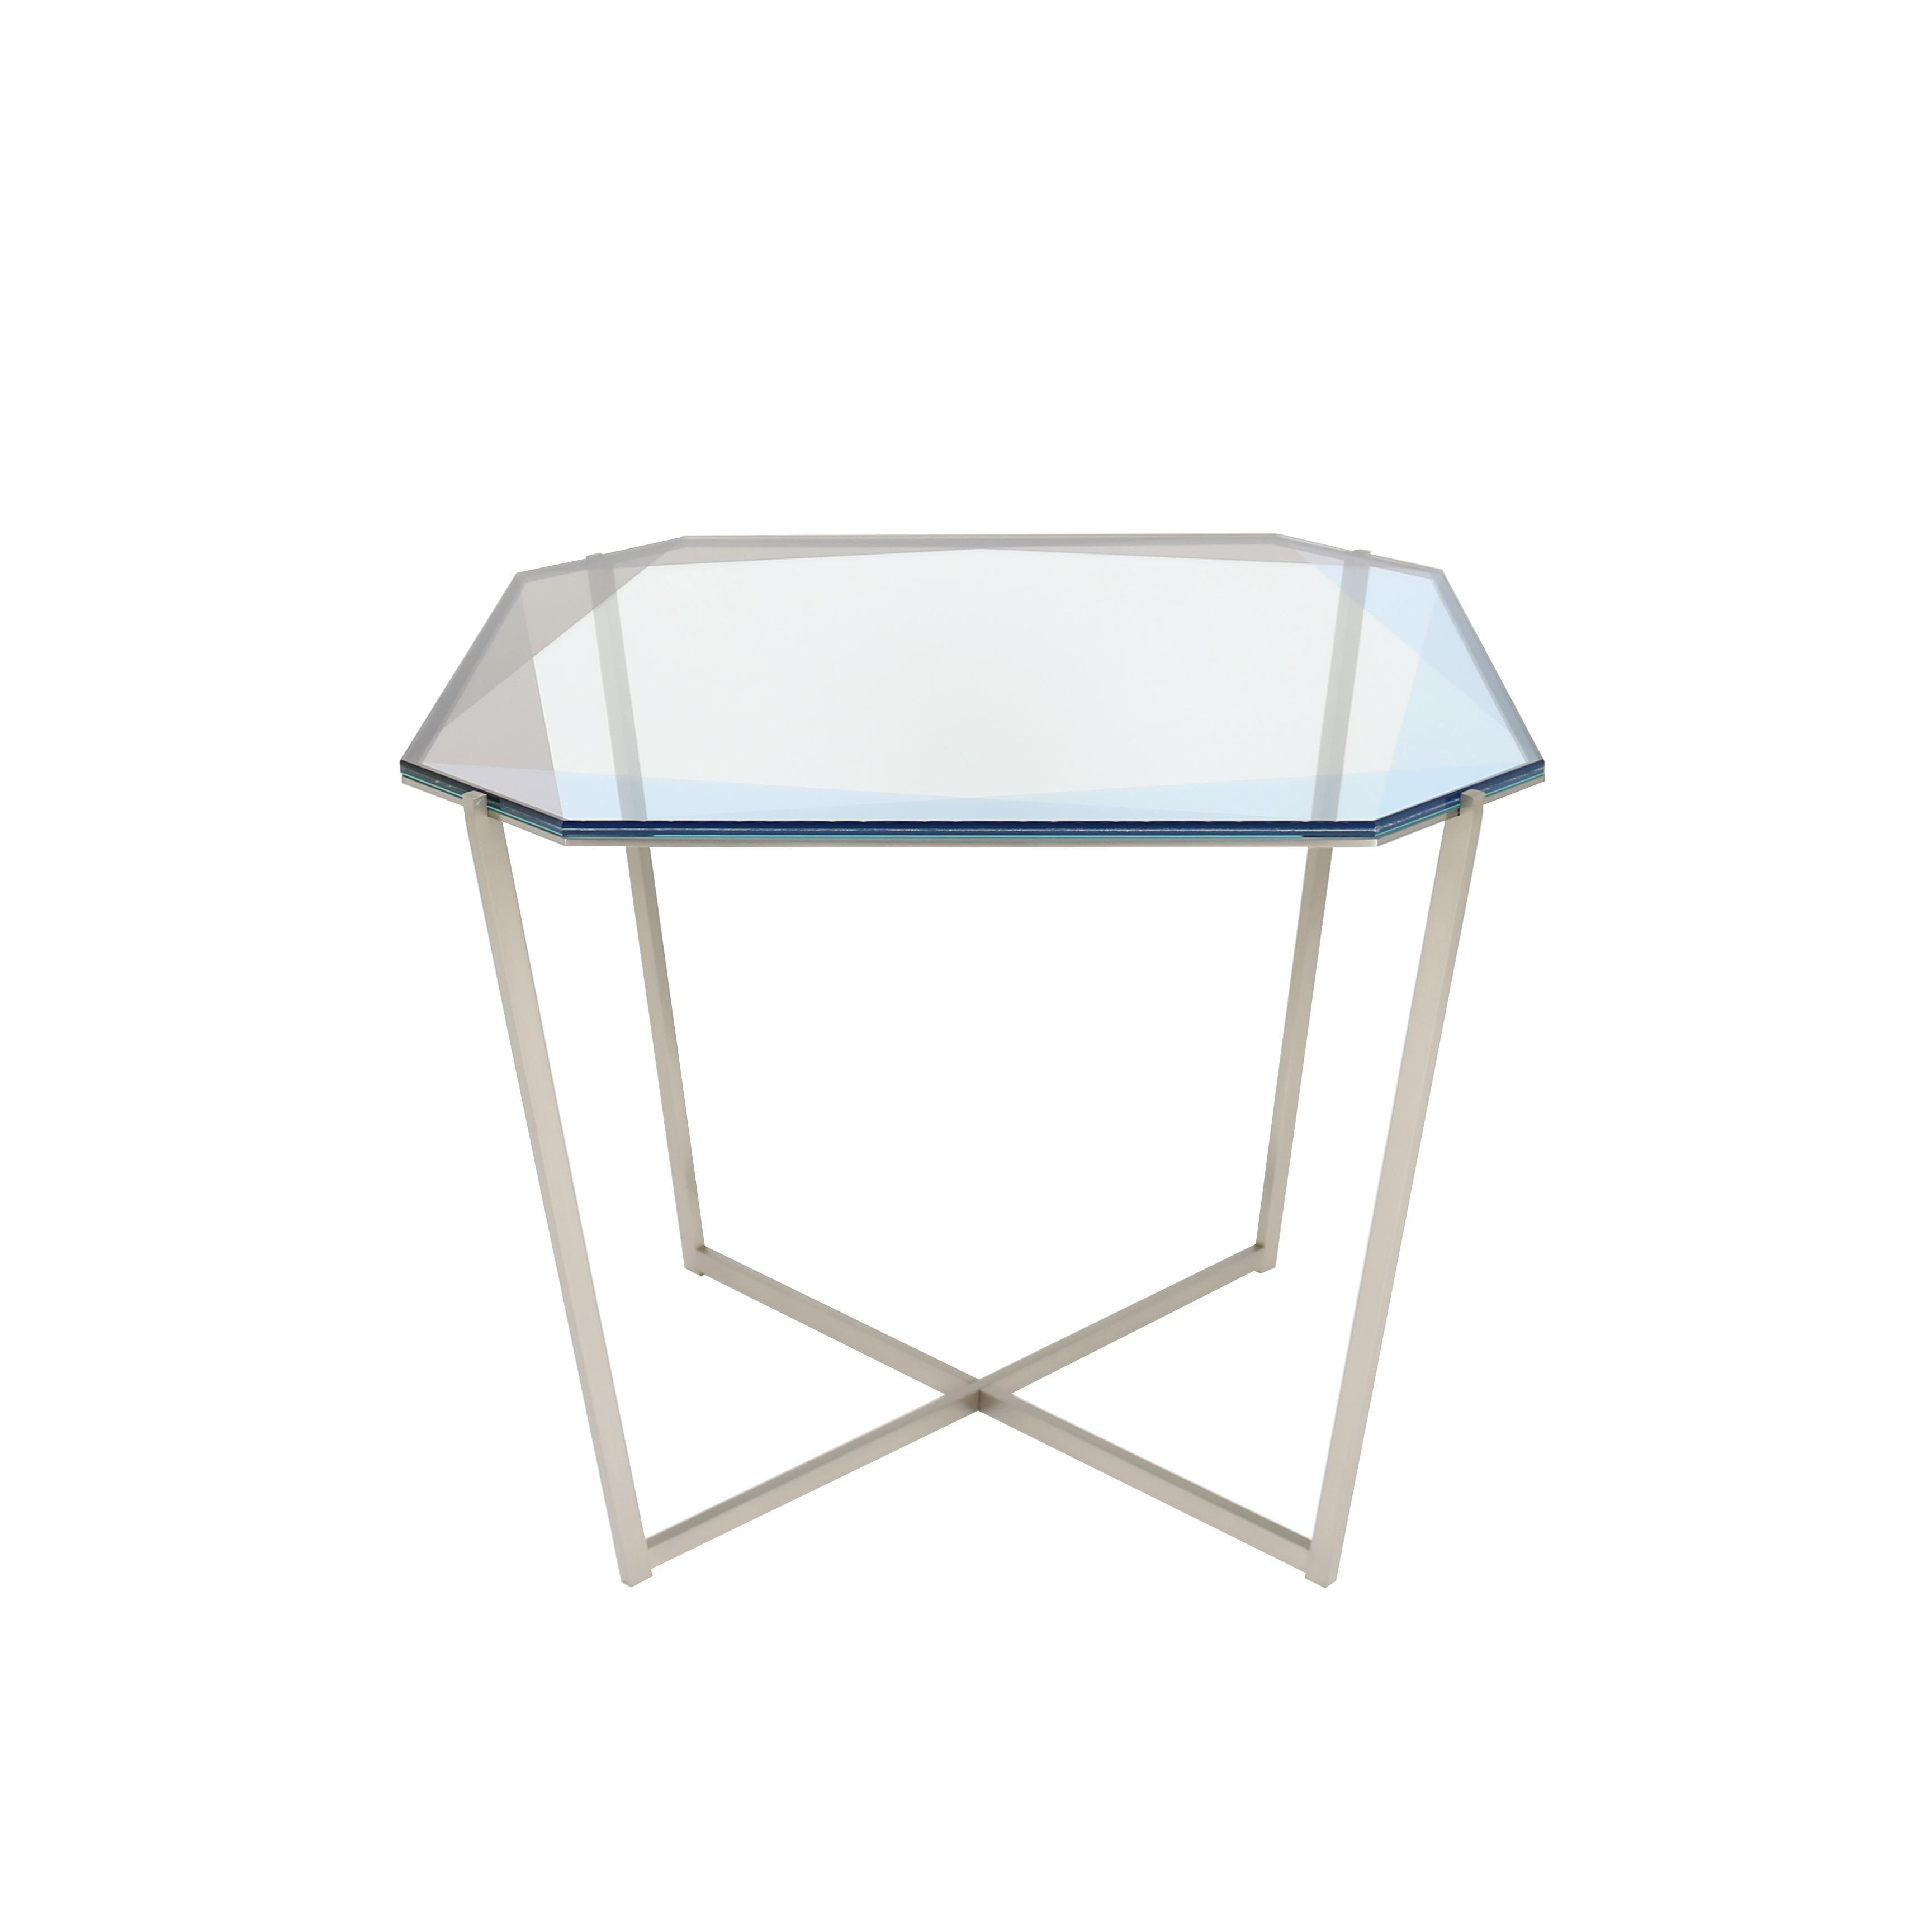 Gem Square Dining / Entry Table - Blue Glass w/ Steel Base by Debra Folz